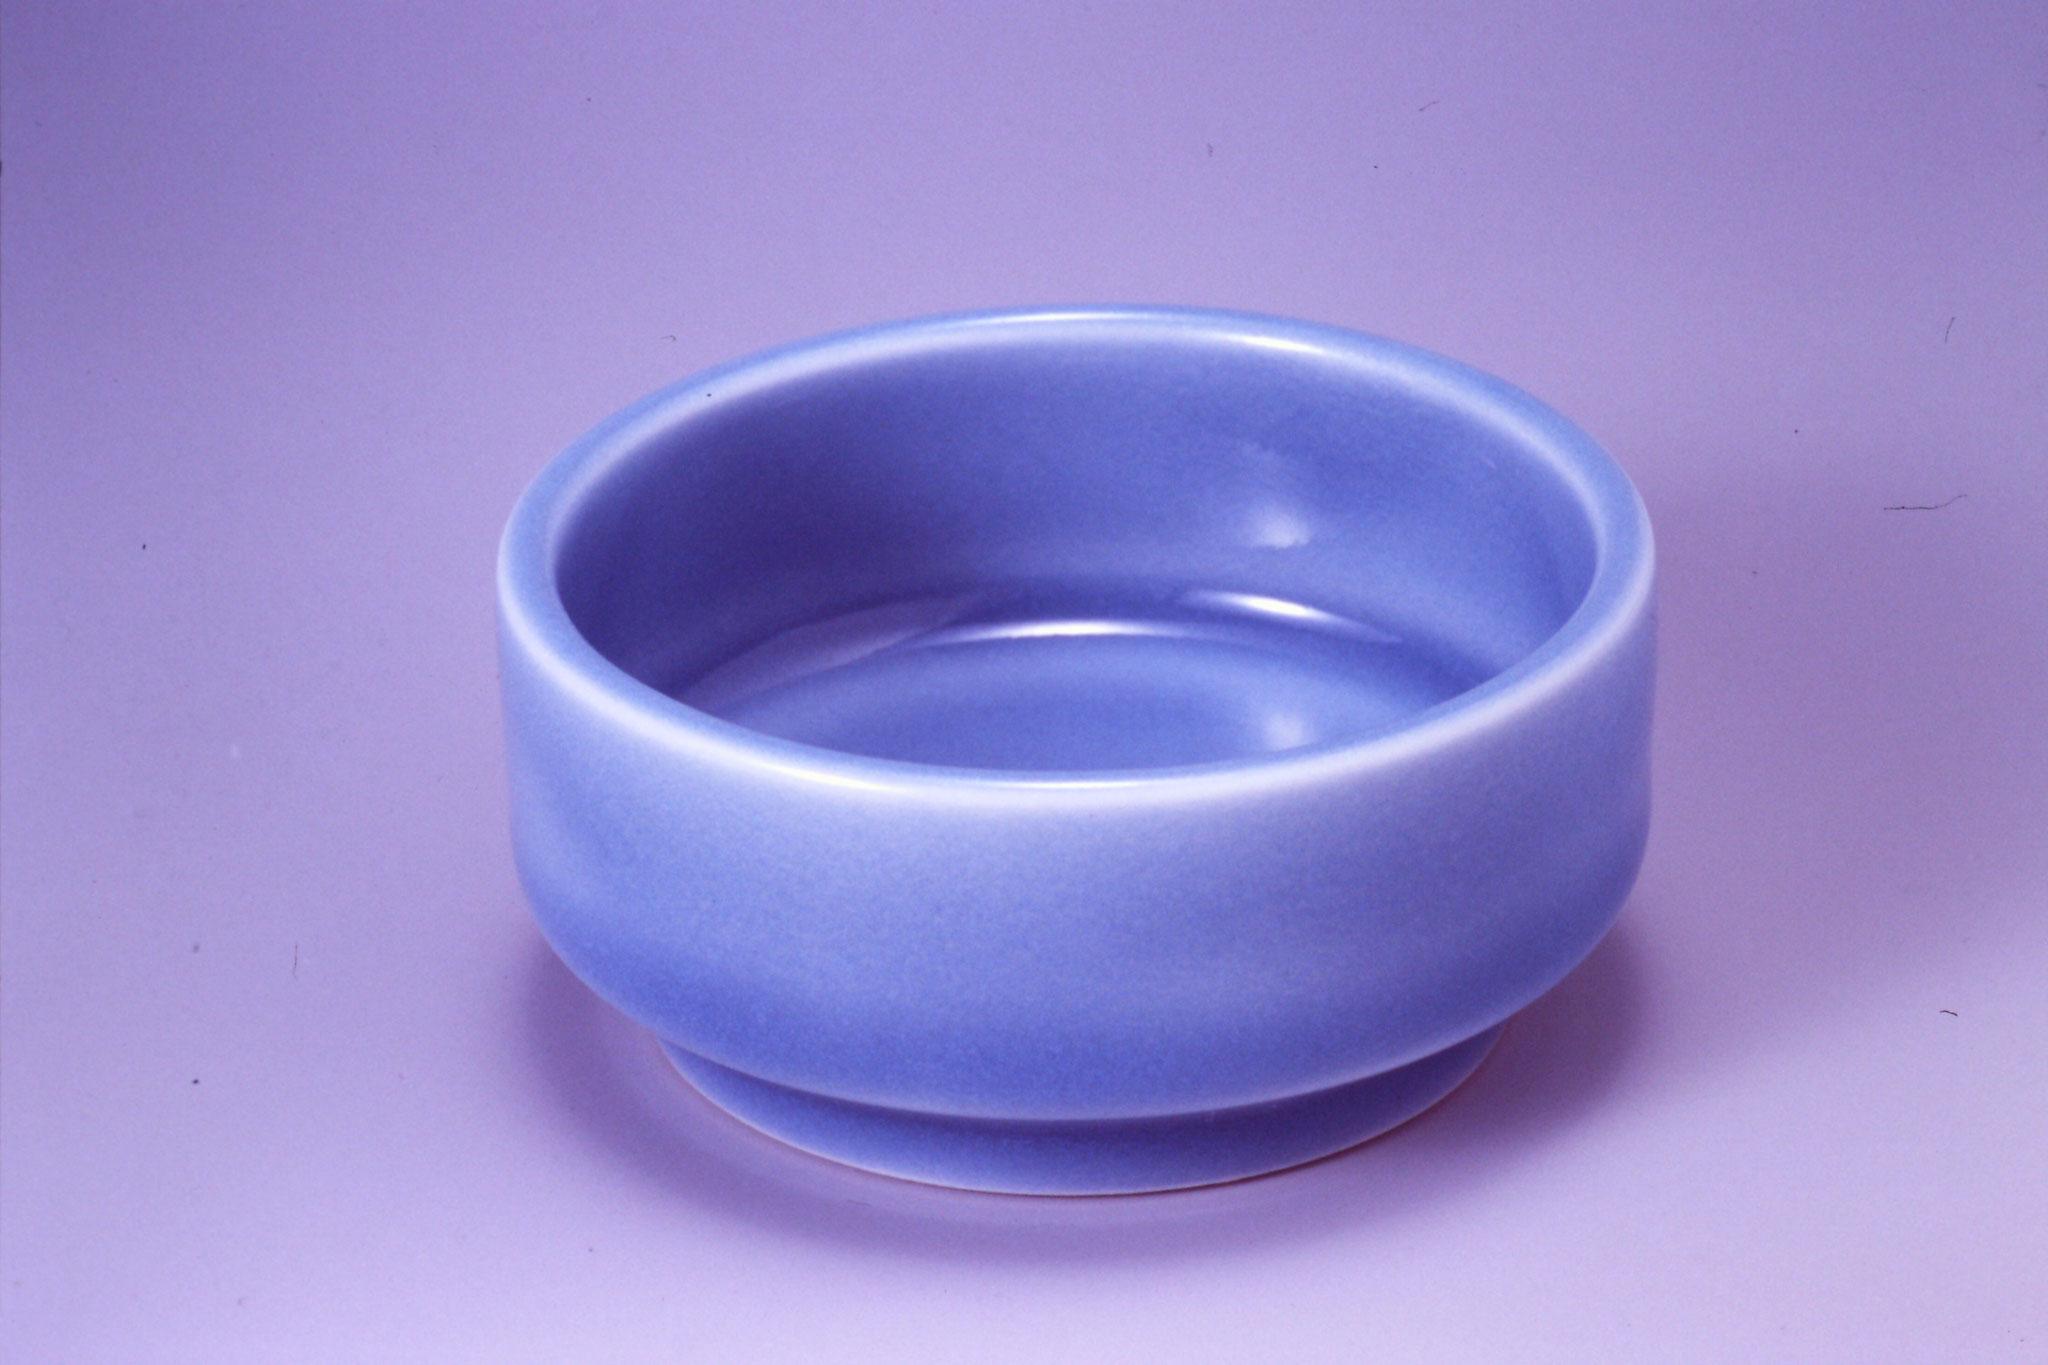 11.均窯ブルー釉 還元焼成1,260~1,300℃